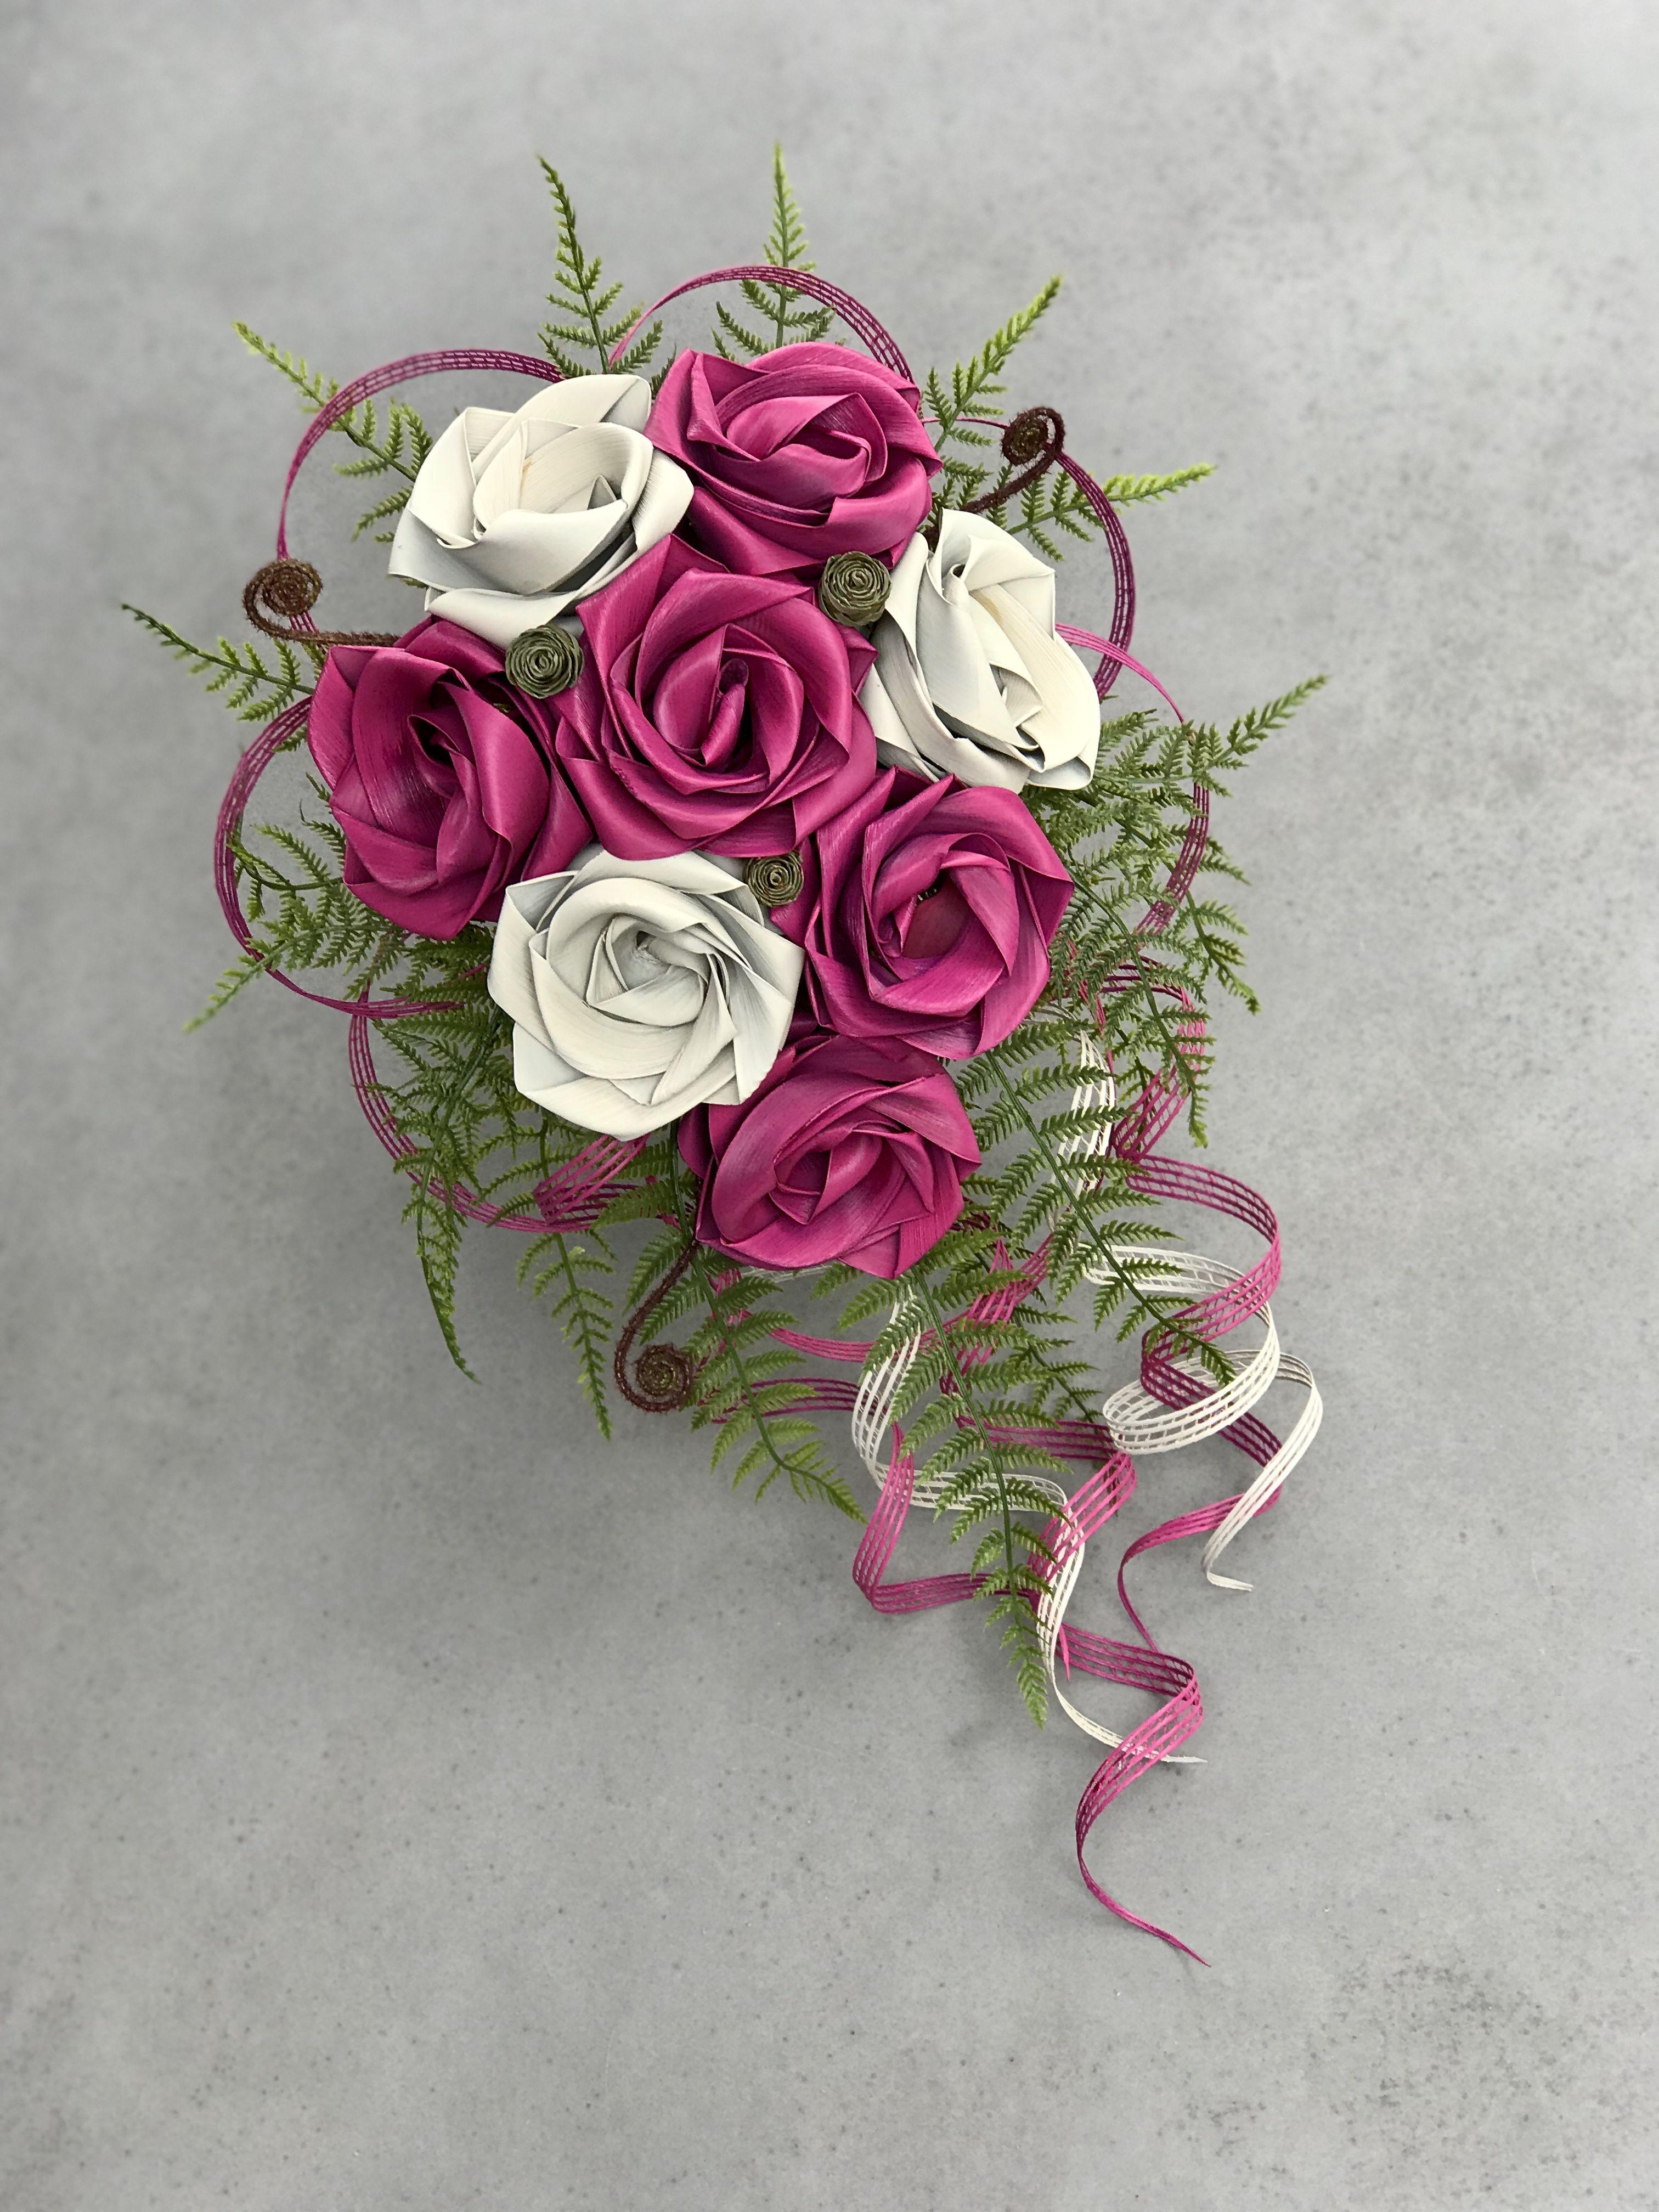 Raspberry white waterfall brides bouquet flower arrangements raspberry white waterfall brides bouquet izmirmasajfo